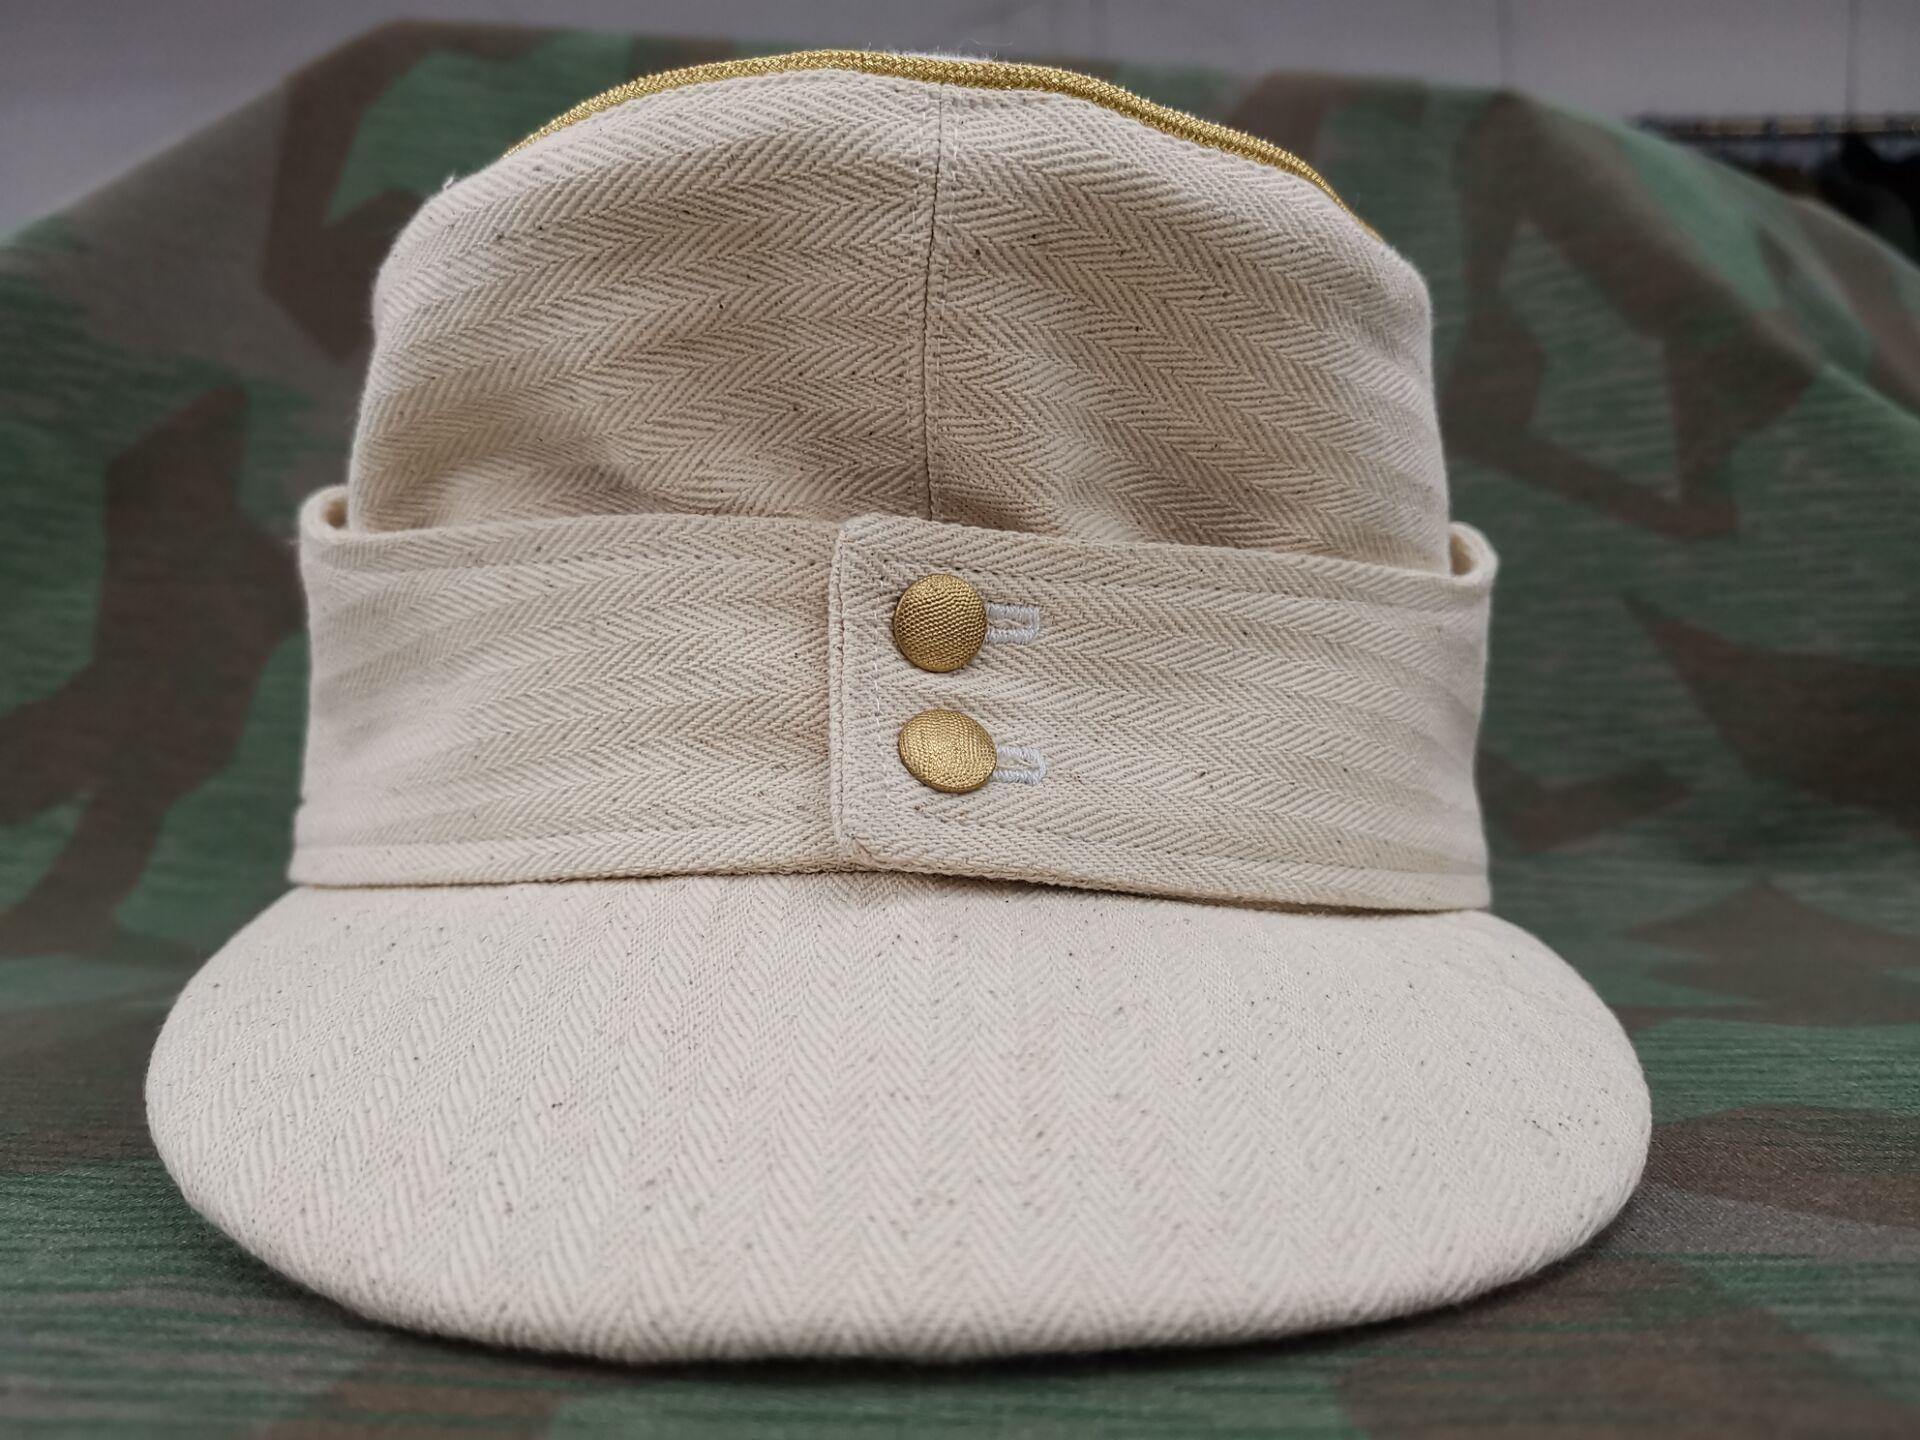 WW2 E.M.D الألمانية. قبعة ضابط M43. HBT